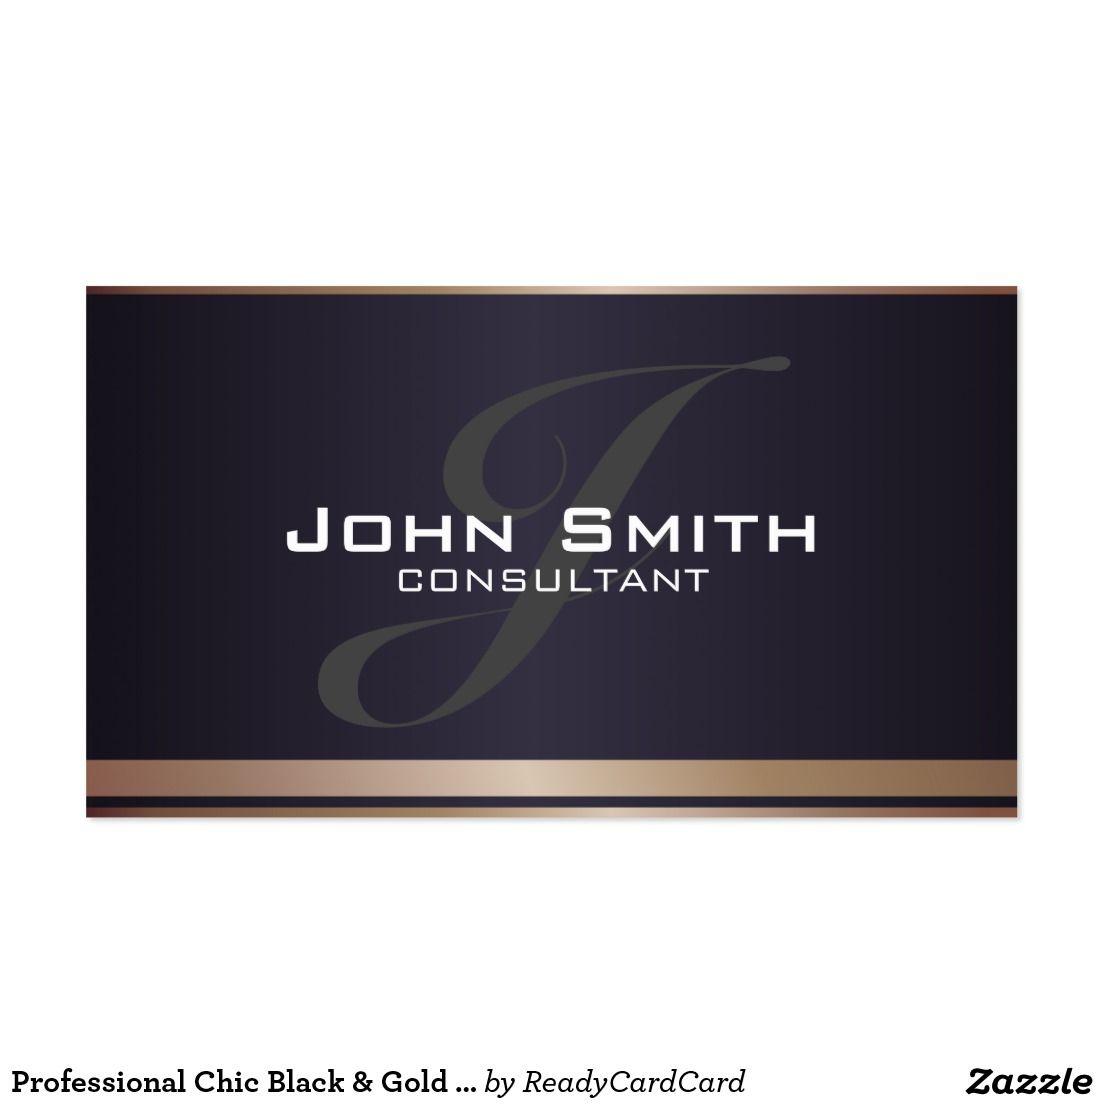 Professional Chic Black & Gold Monogram Consultant Business Card ...